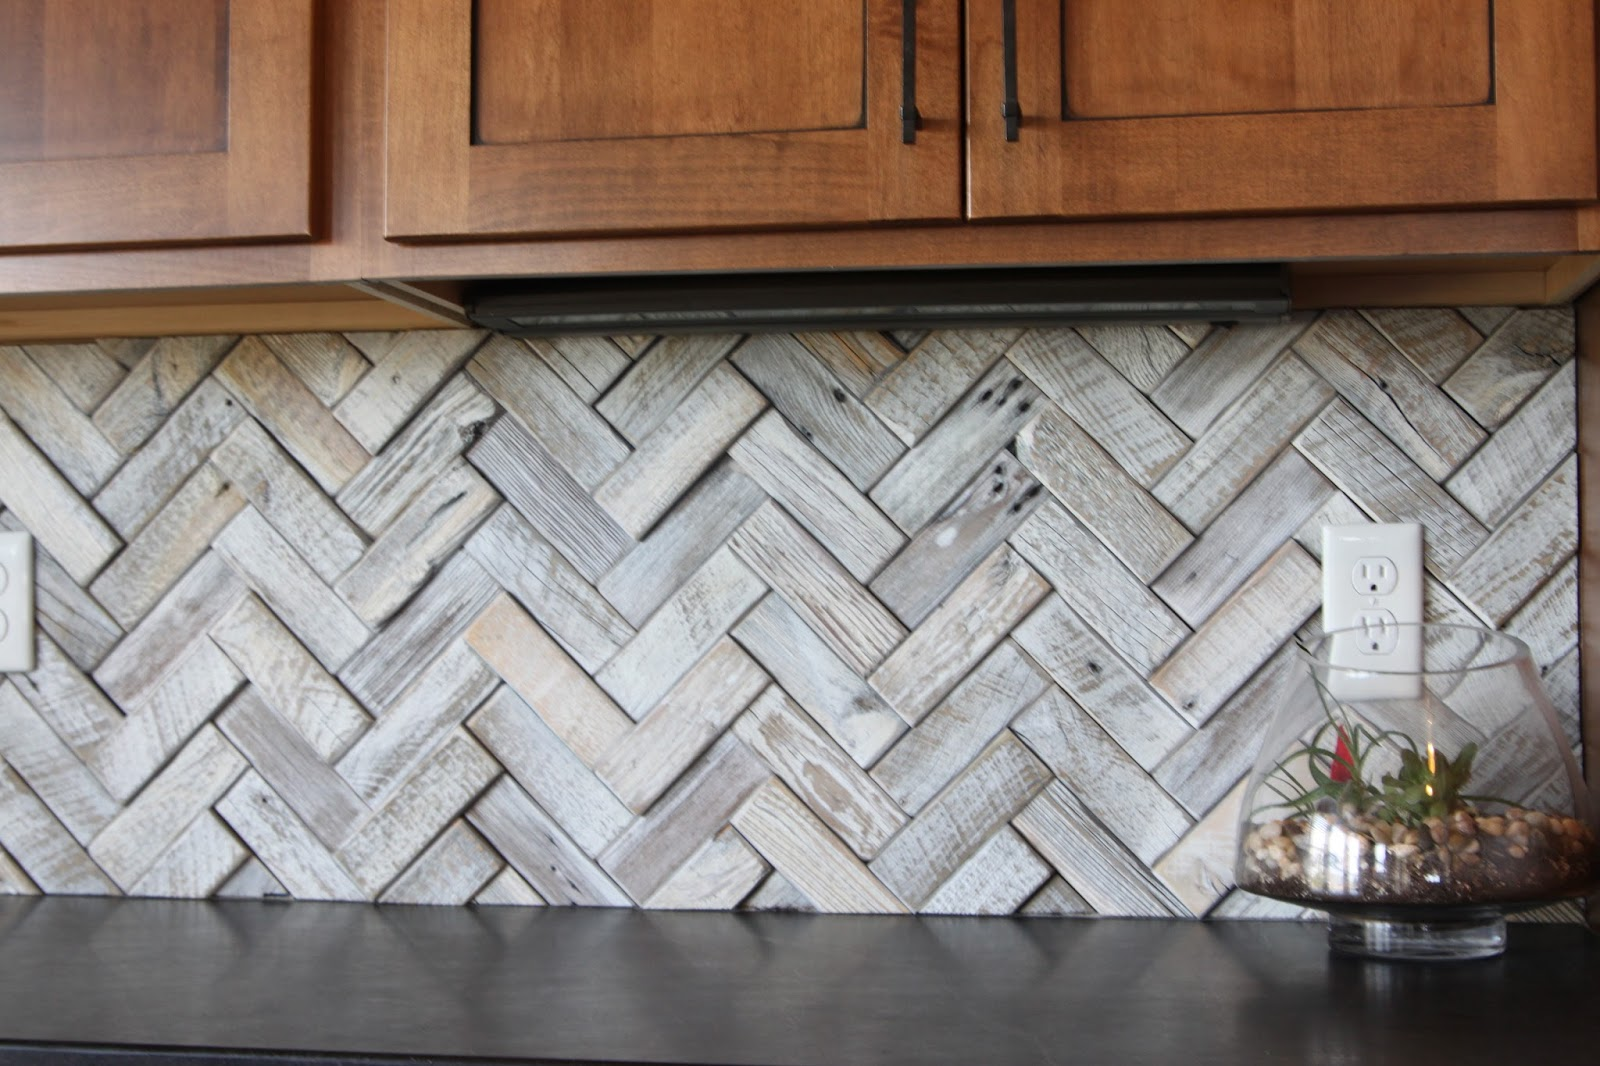 - Paper Blog: Reclaimed Wood As A Backsplash